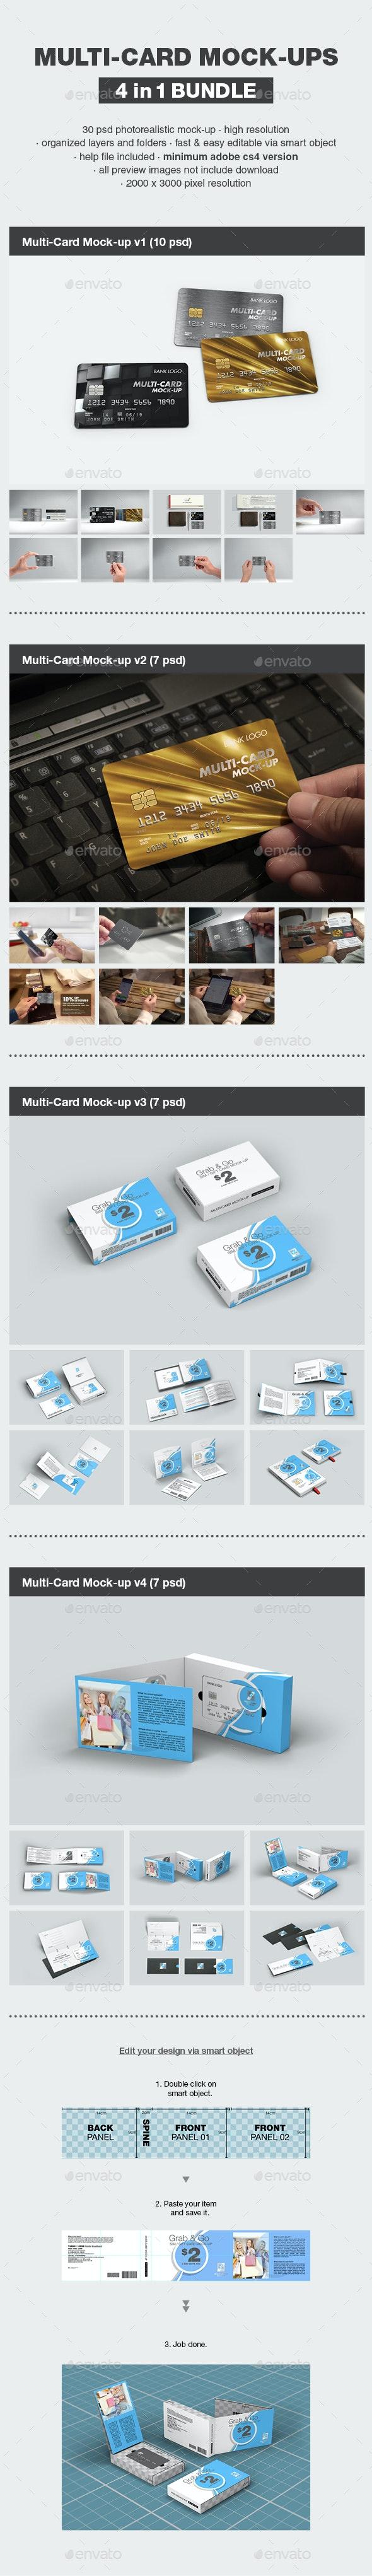 Multi-Card Mock-up Bundle - Print Product Mock-Ups